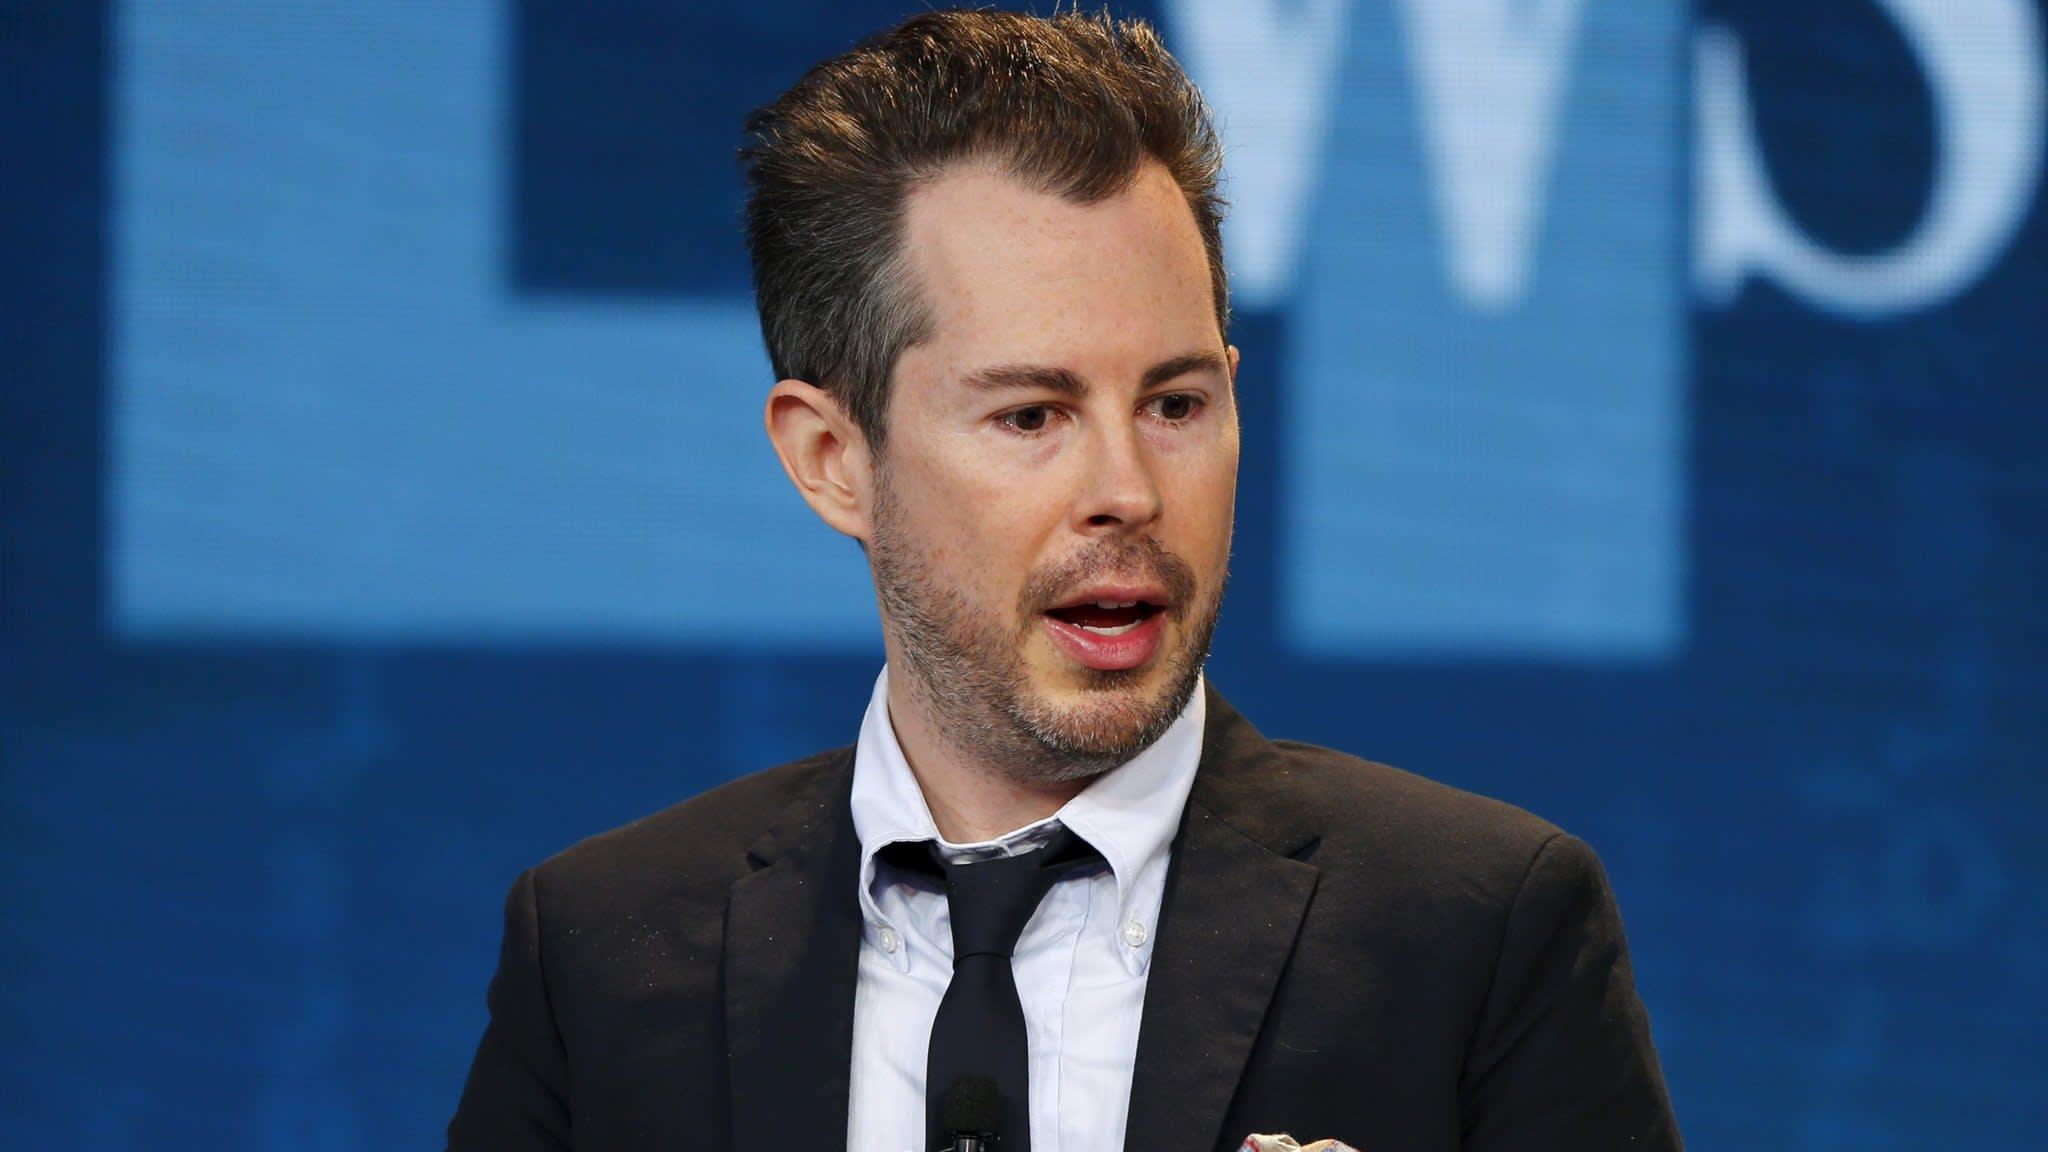 Tech start-ups waiting 'way too long' for IPO   Financial Times